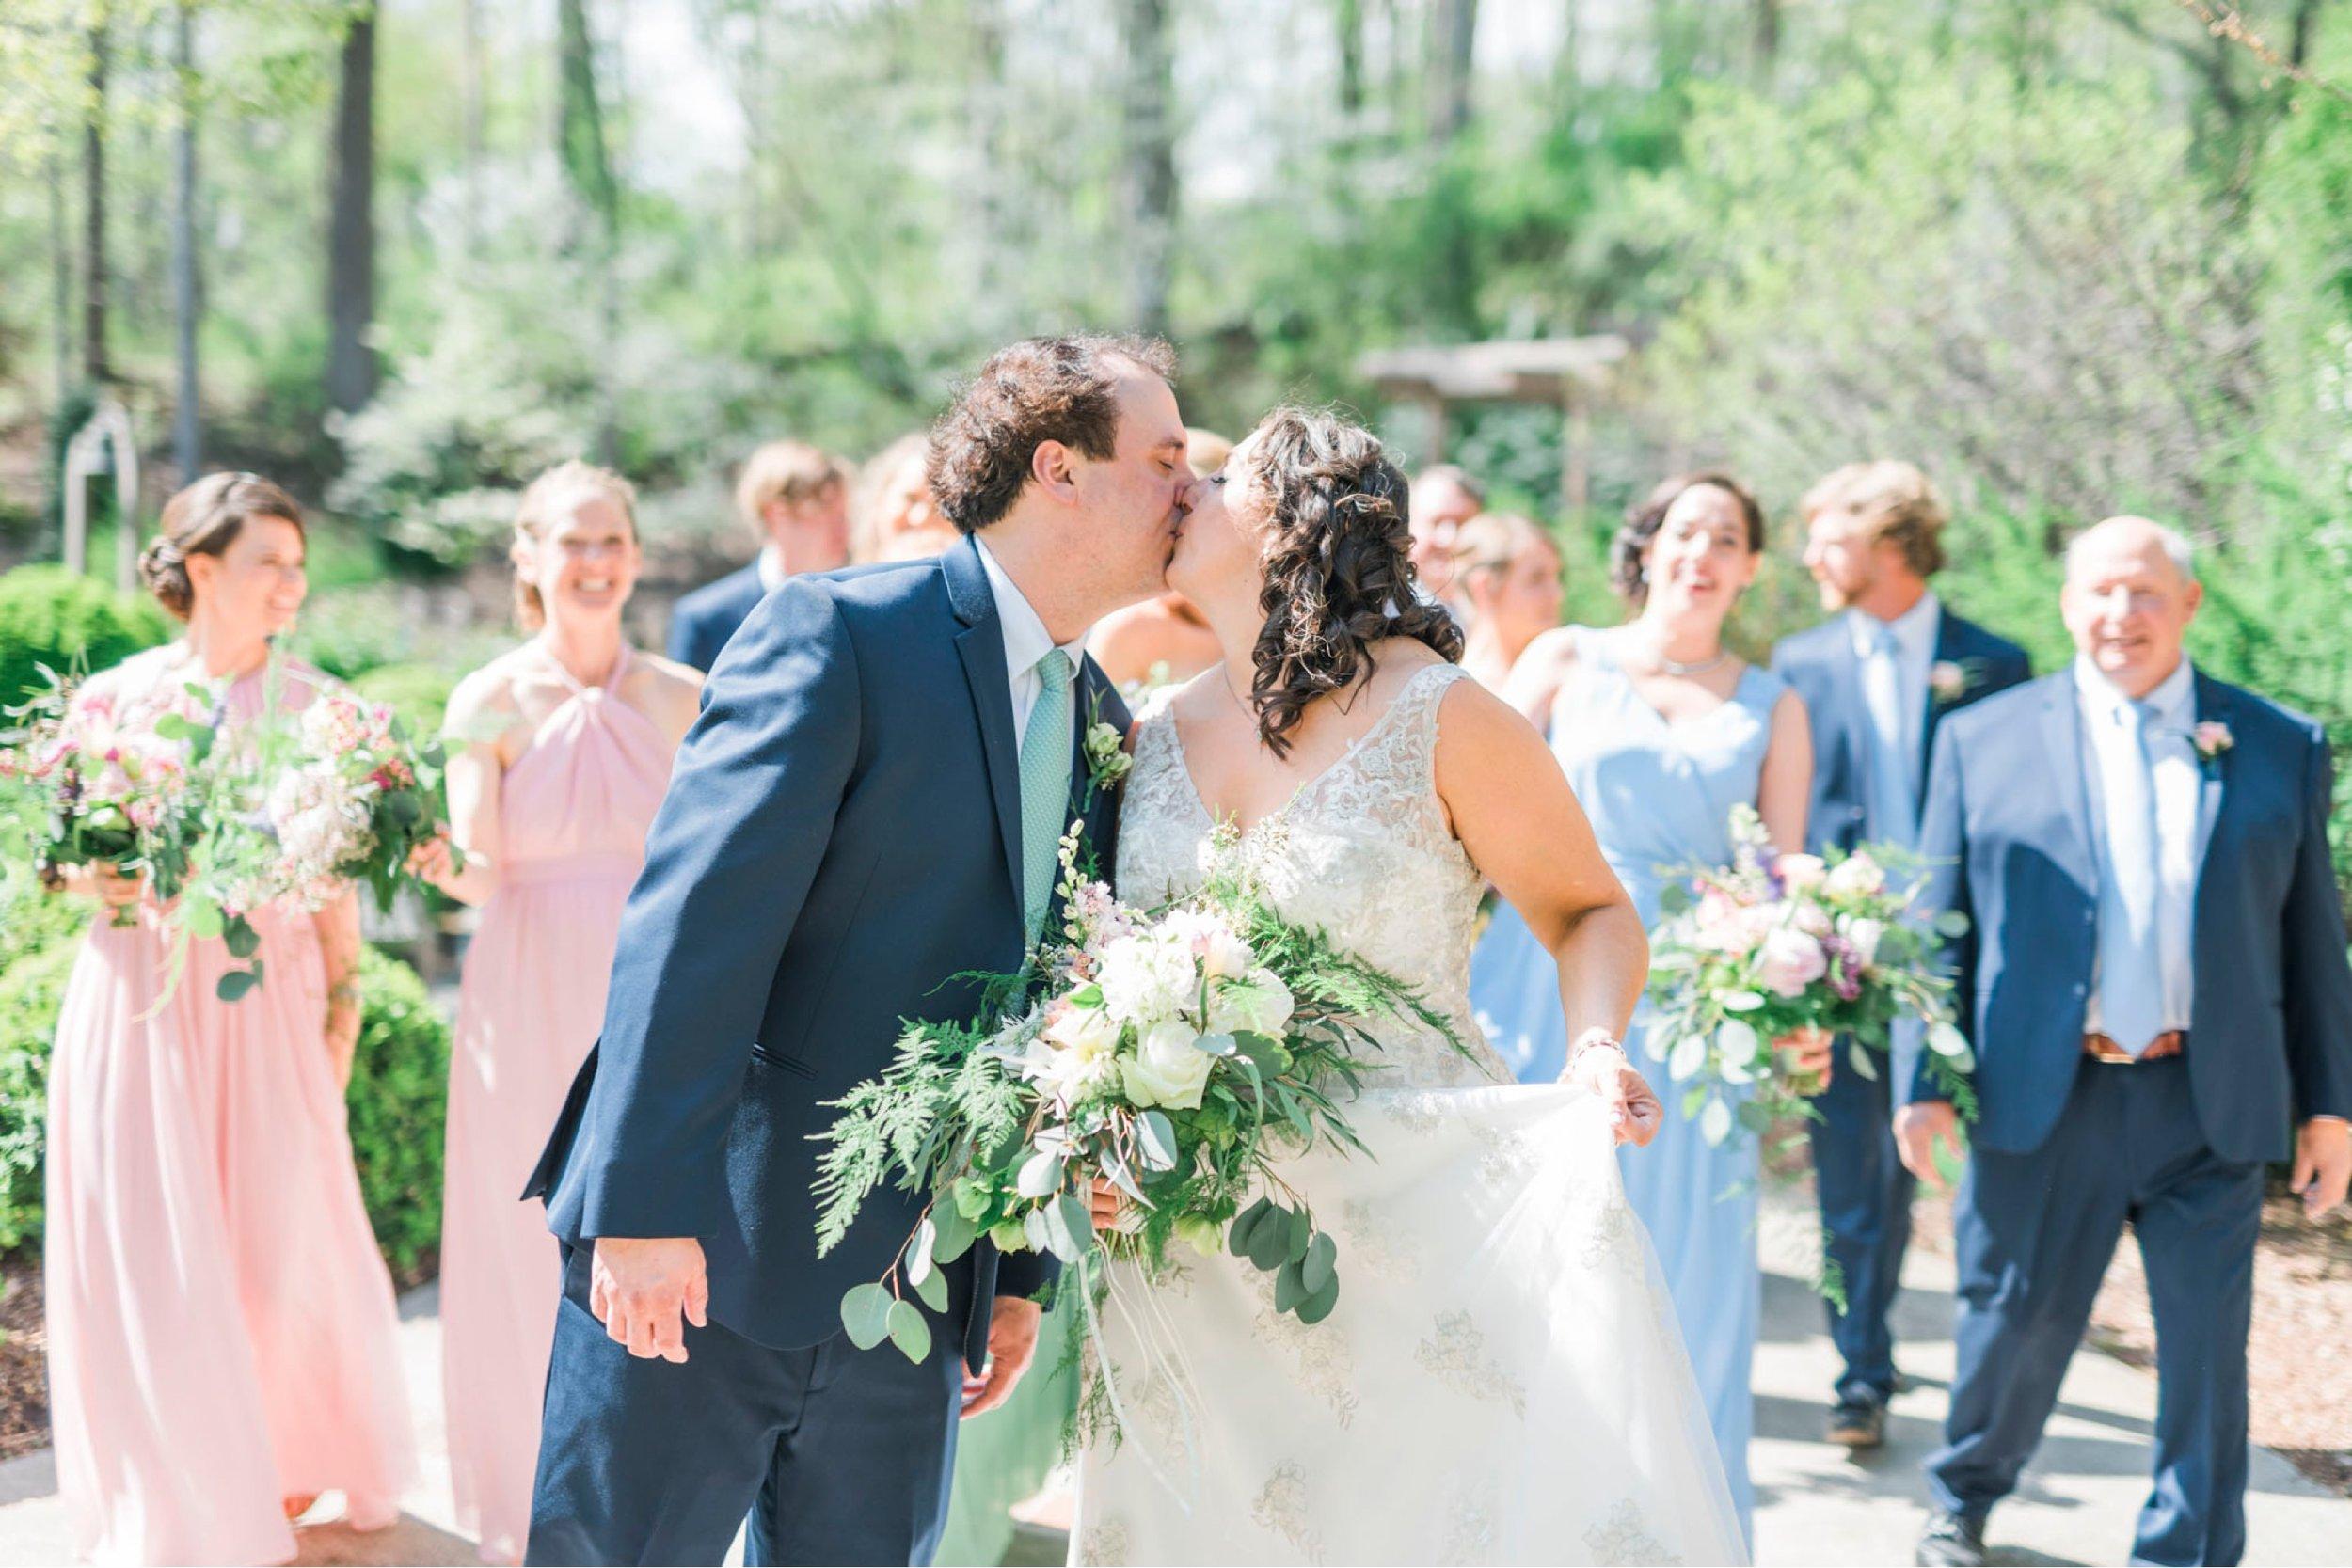 TheVirginianHotel_LynchburgVA_TheVirginianHotelWedding_Virginiaweddingphotographer_Lynchburgvawedding 42.jpg